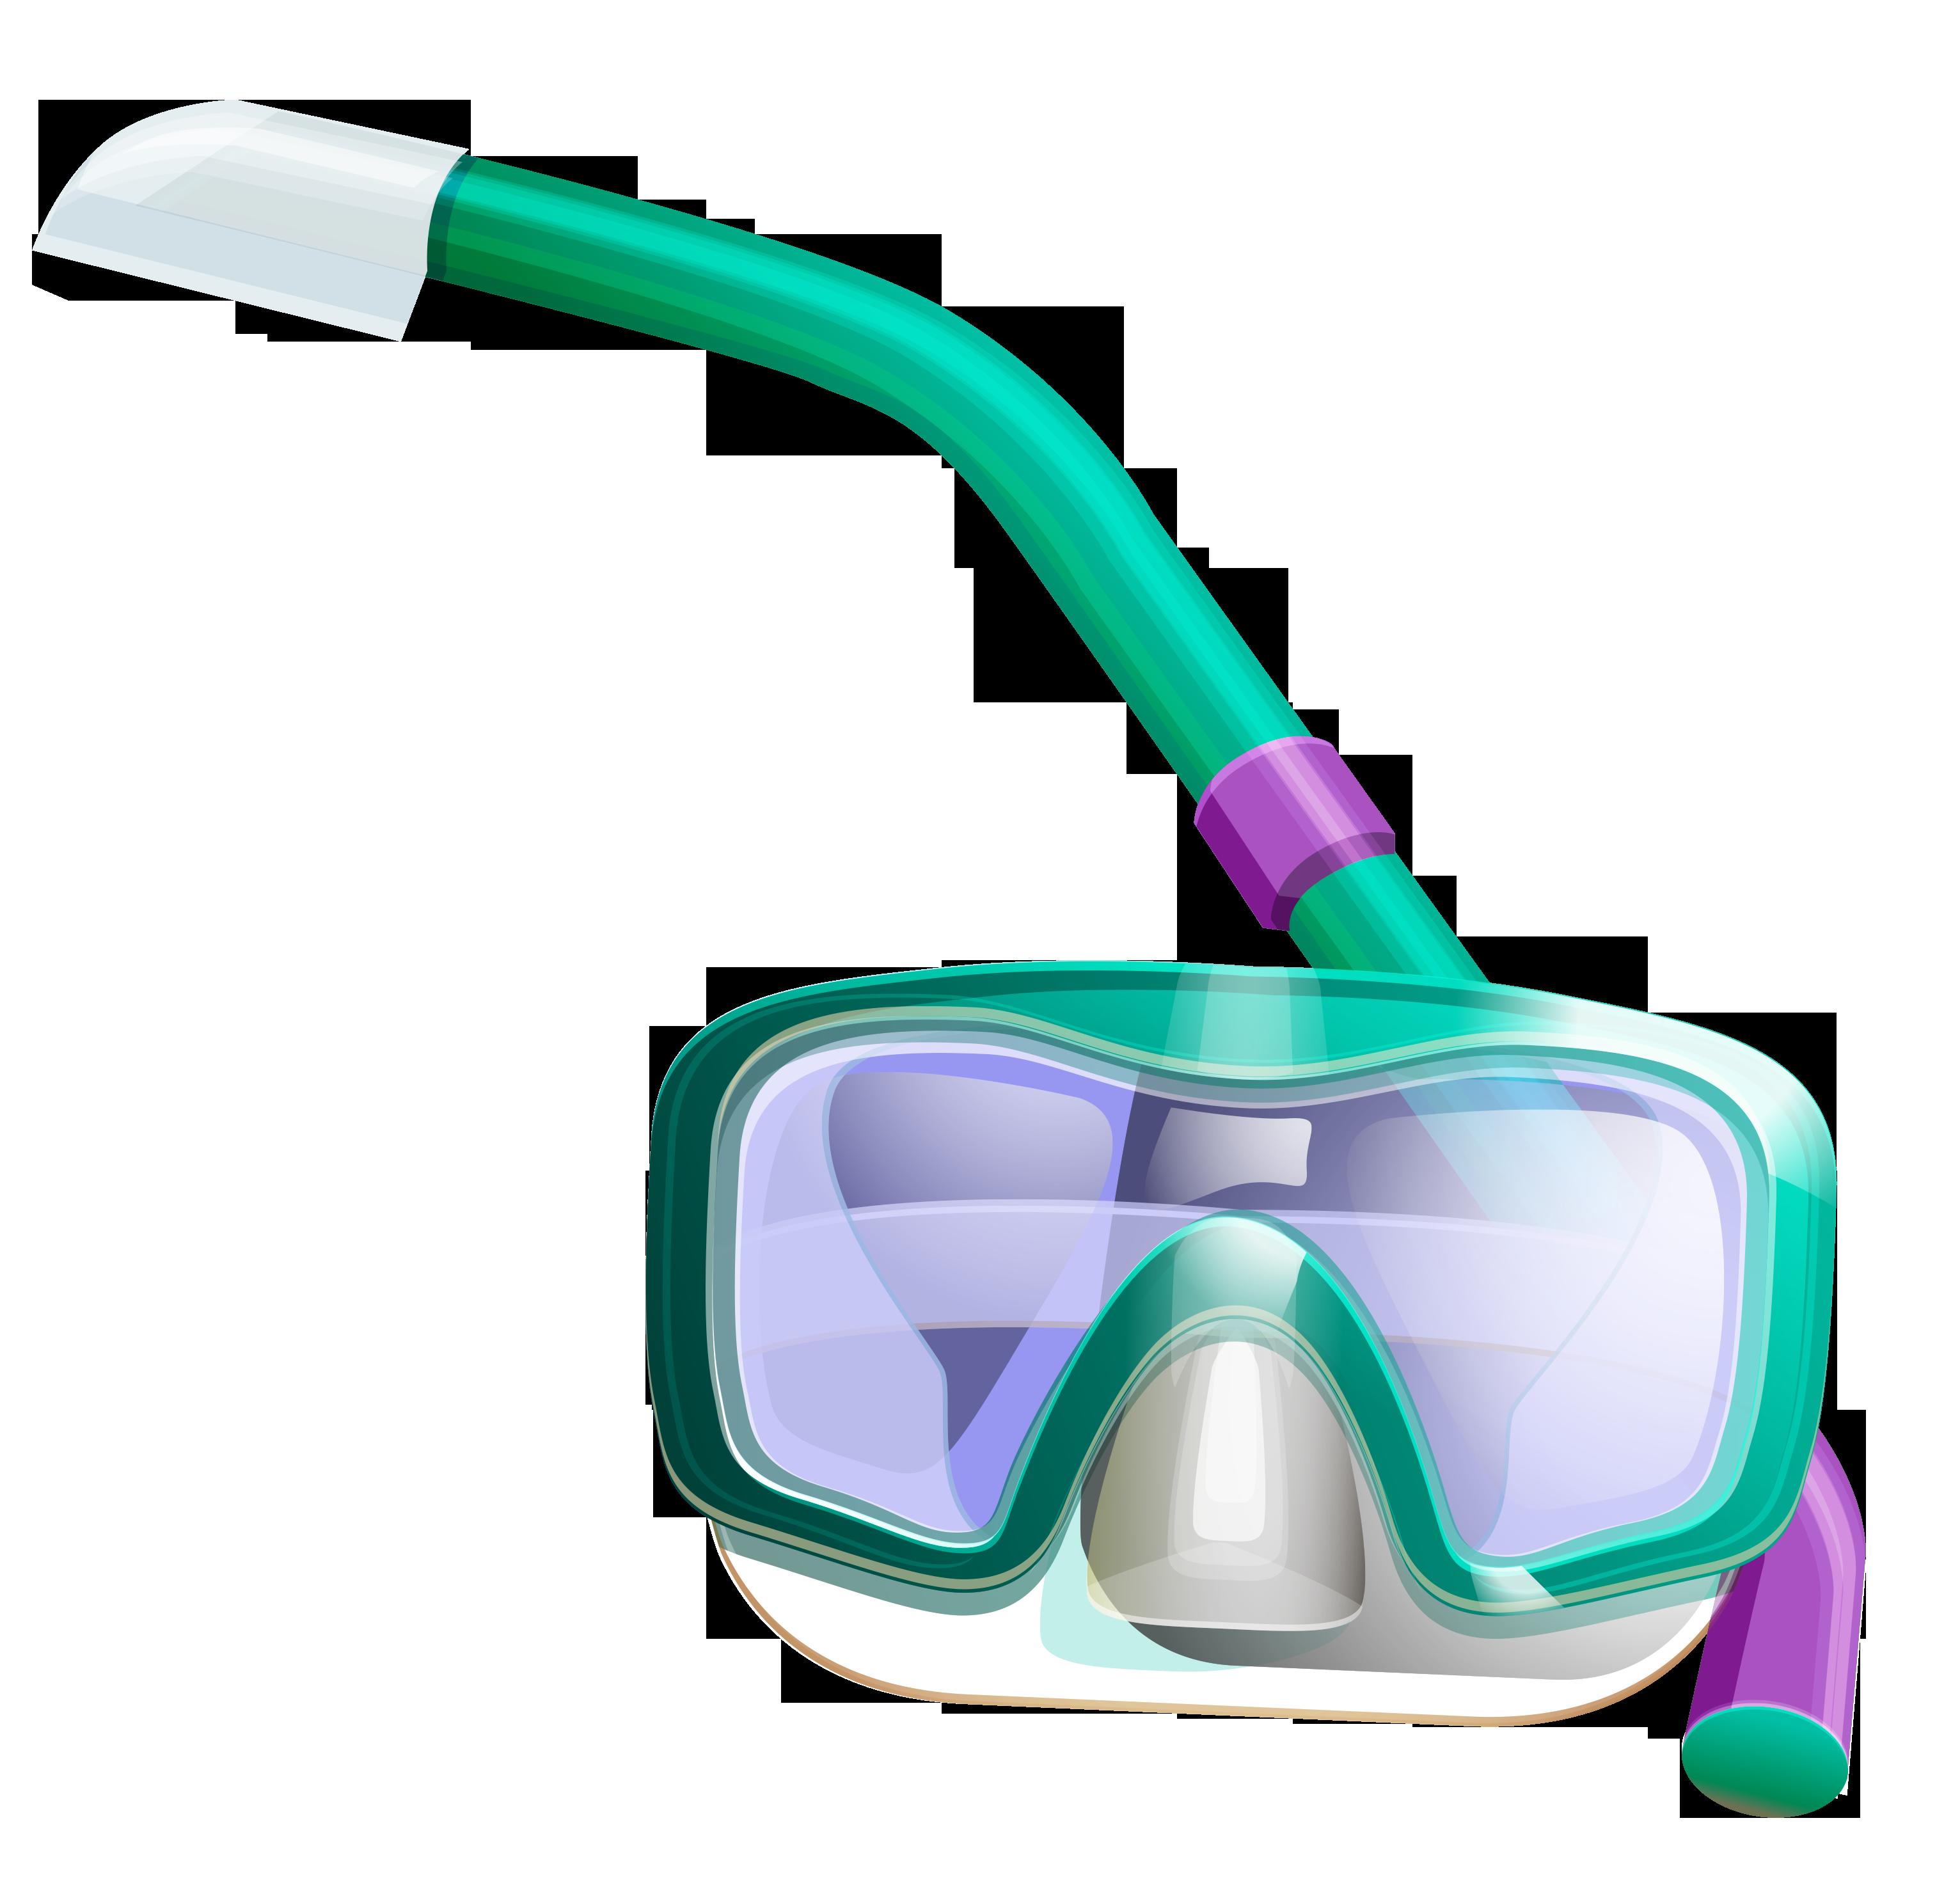 Tufi resort snorkeling scuba. Goggles clipart swimming mask